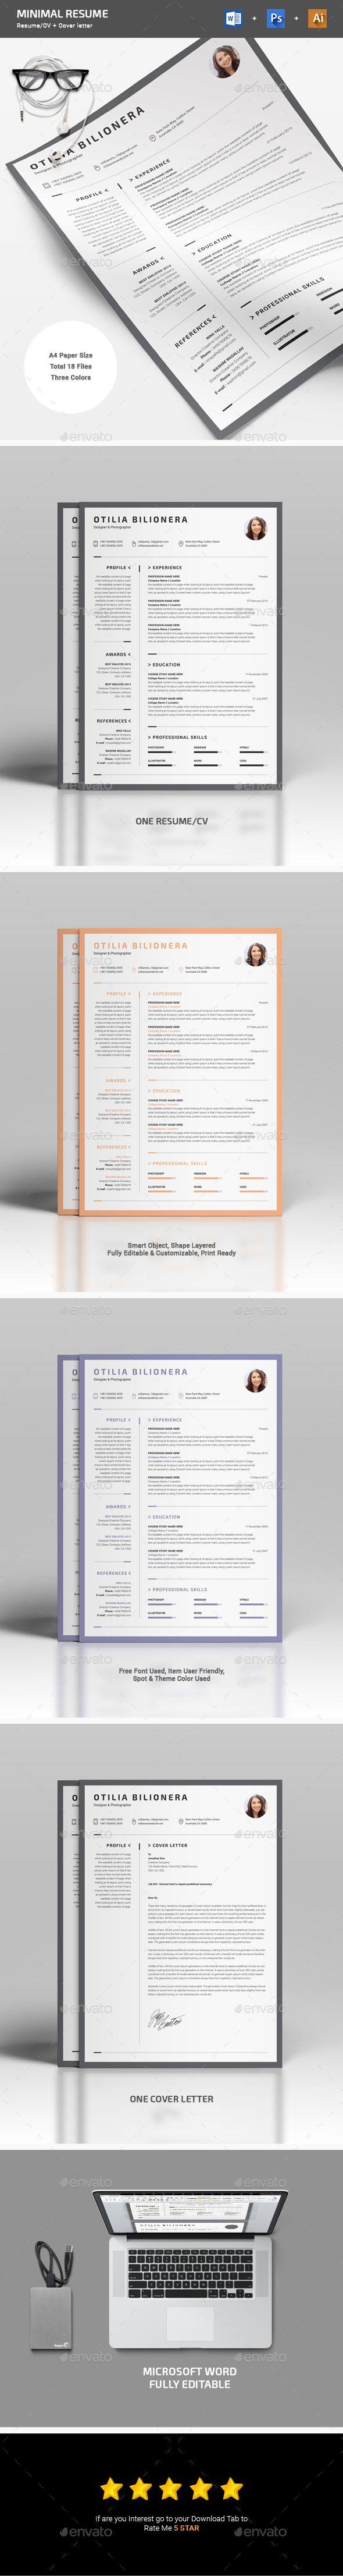 Minimal #Resume - Resumes #Stationery Download here: https://graphicriver.net/item/minimal-resume/19505101?ref=alena994